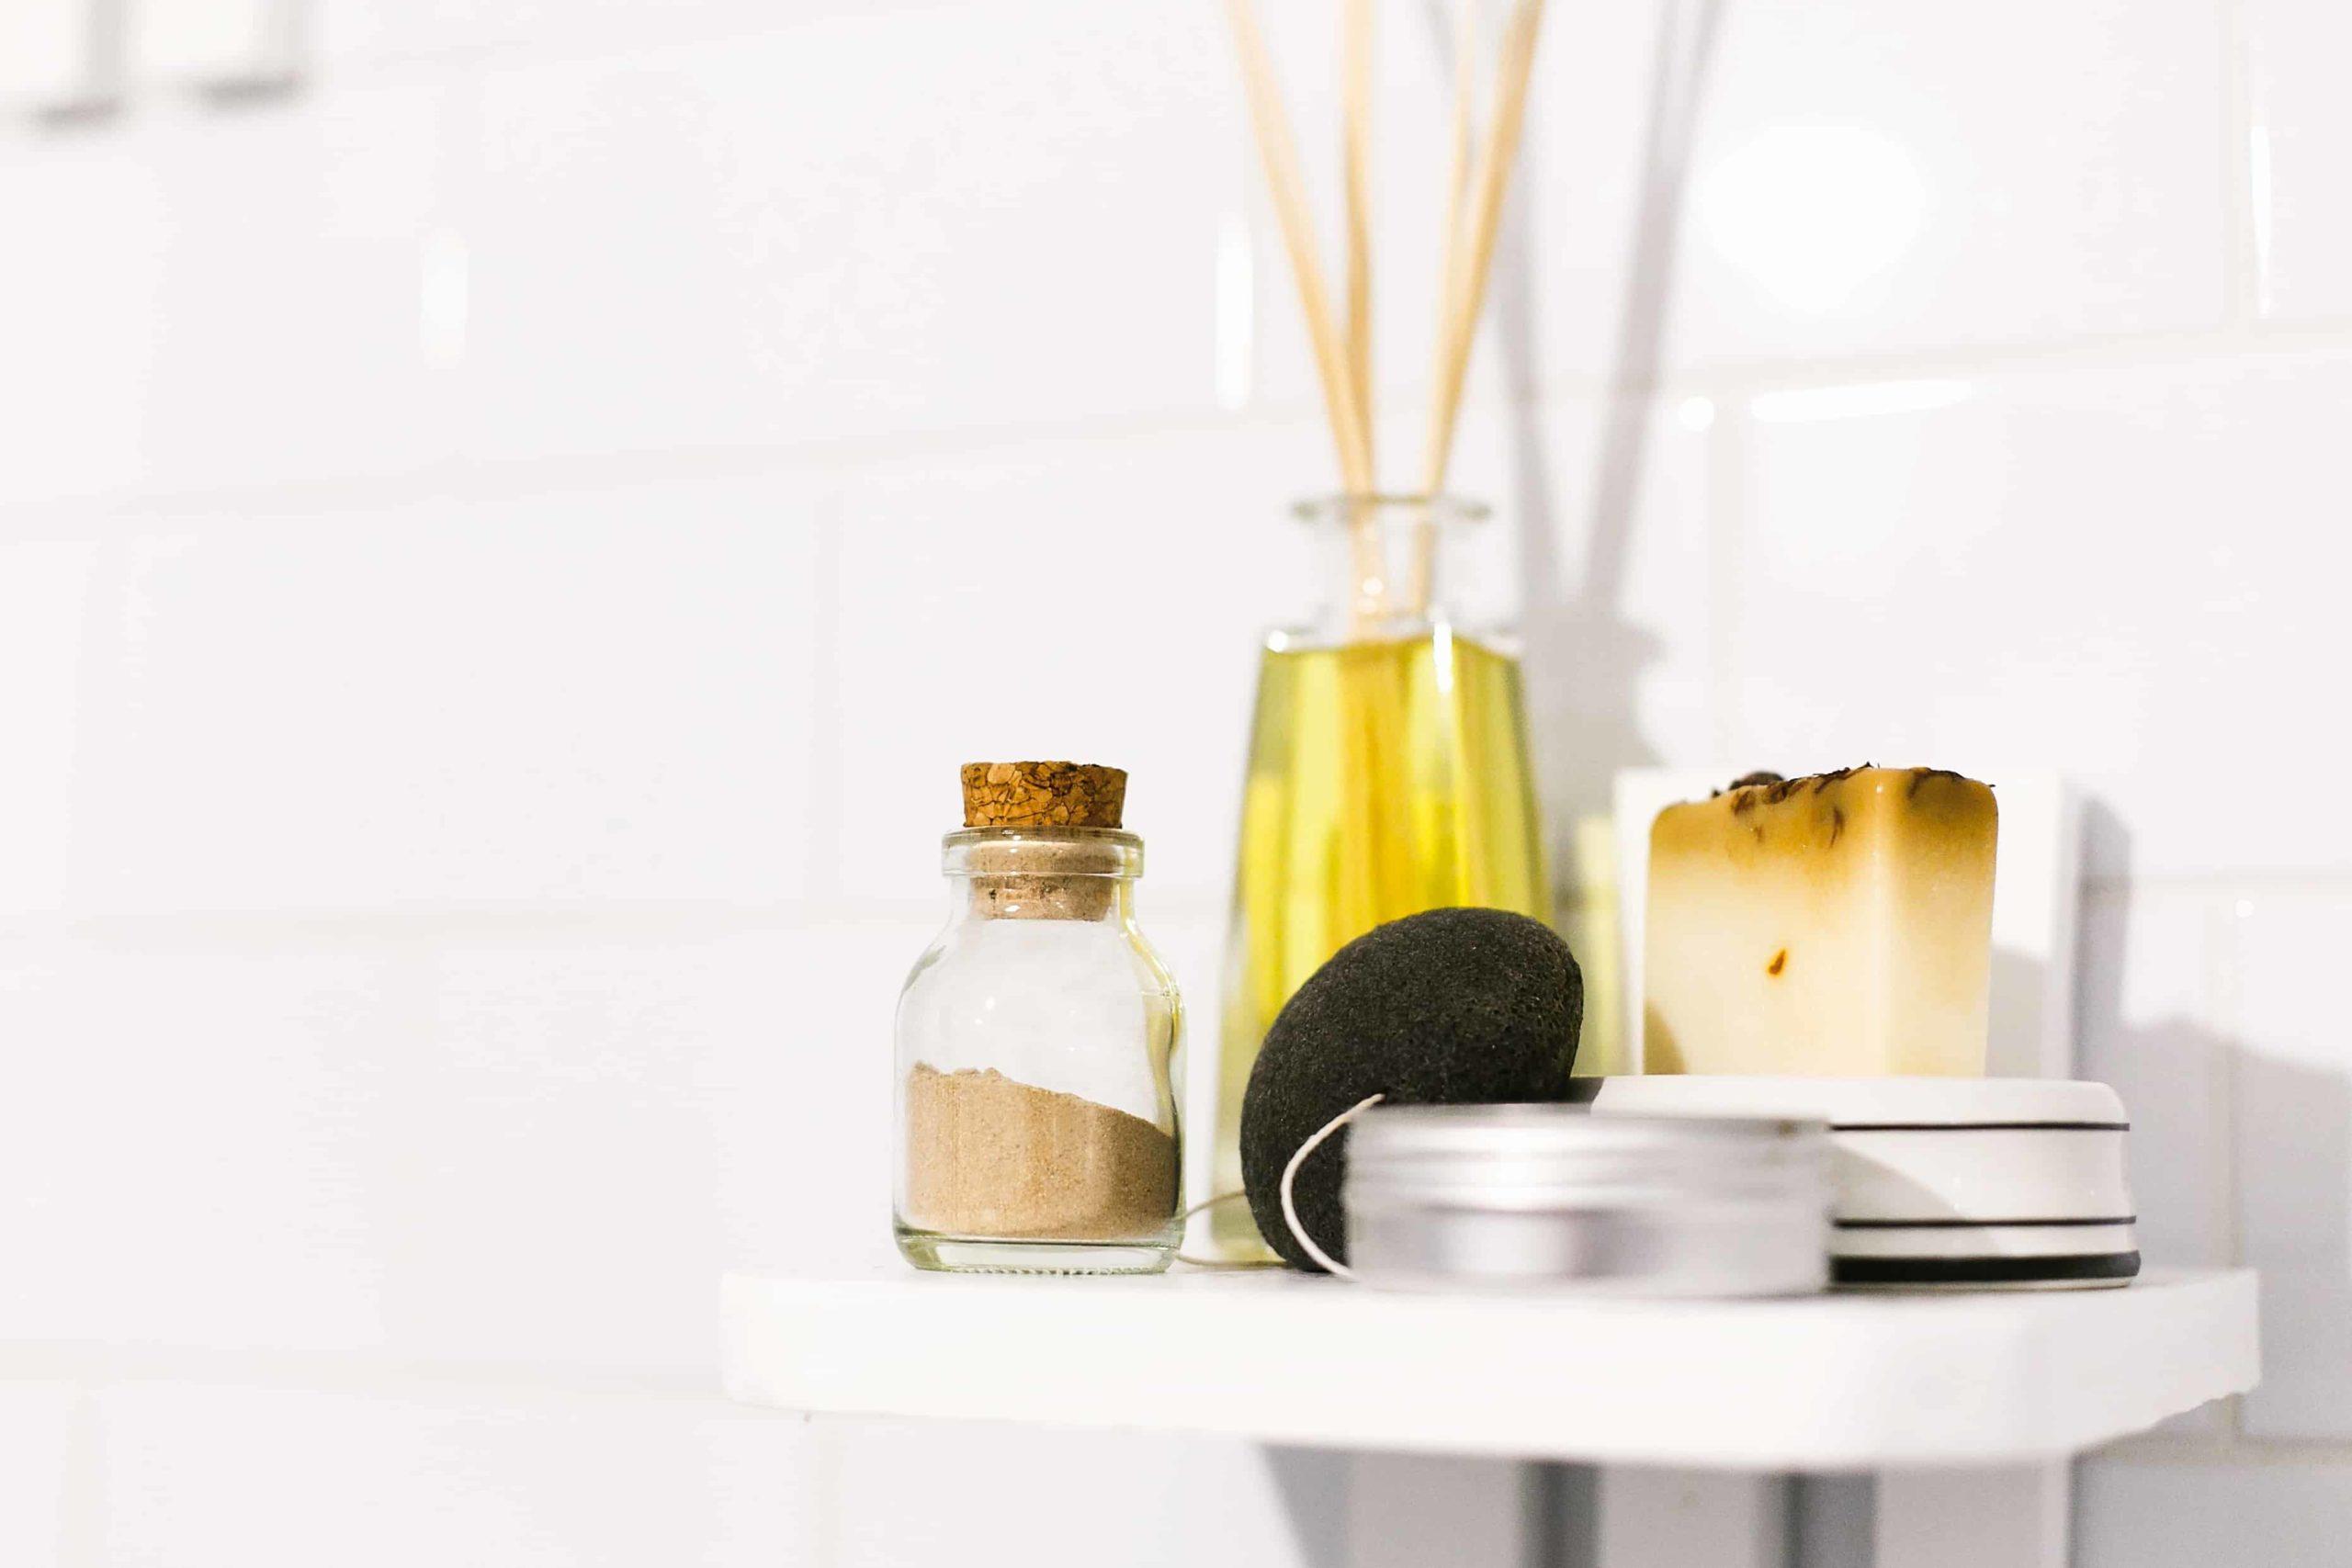 You are currently viewing מפיצי ריח לשירותים – איך רוכשים ואיפה נכון לשים אותם?